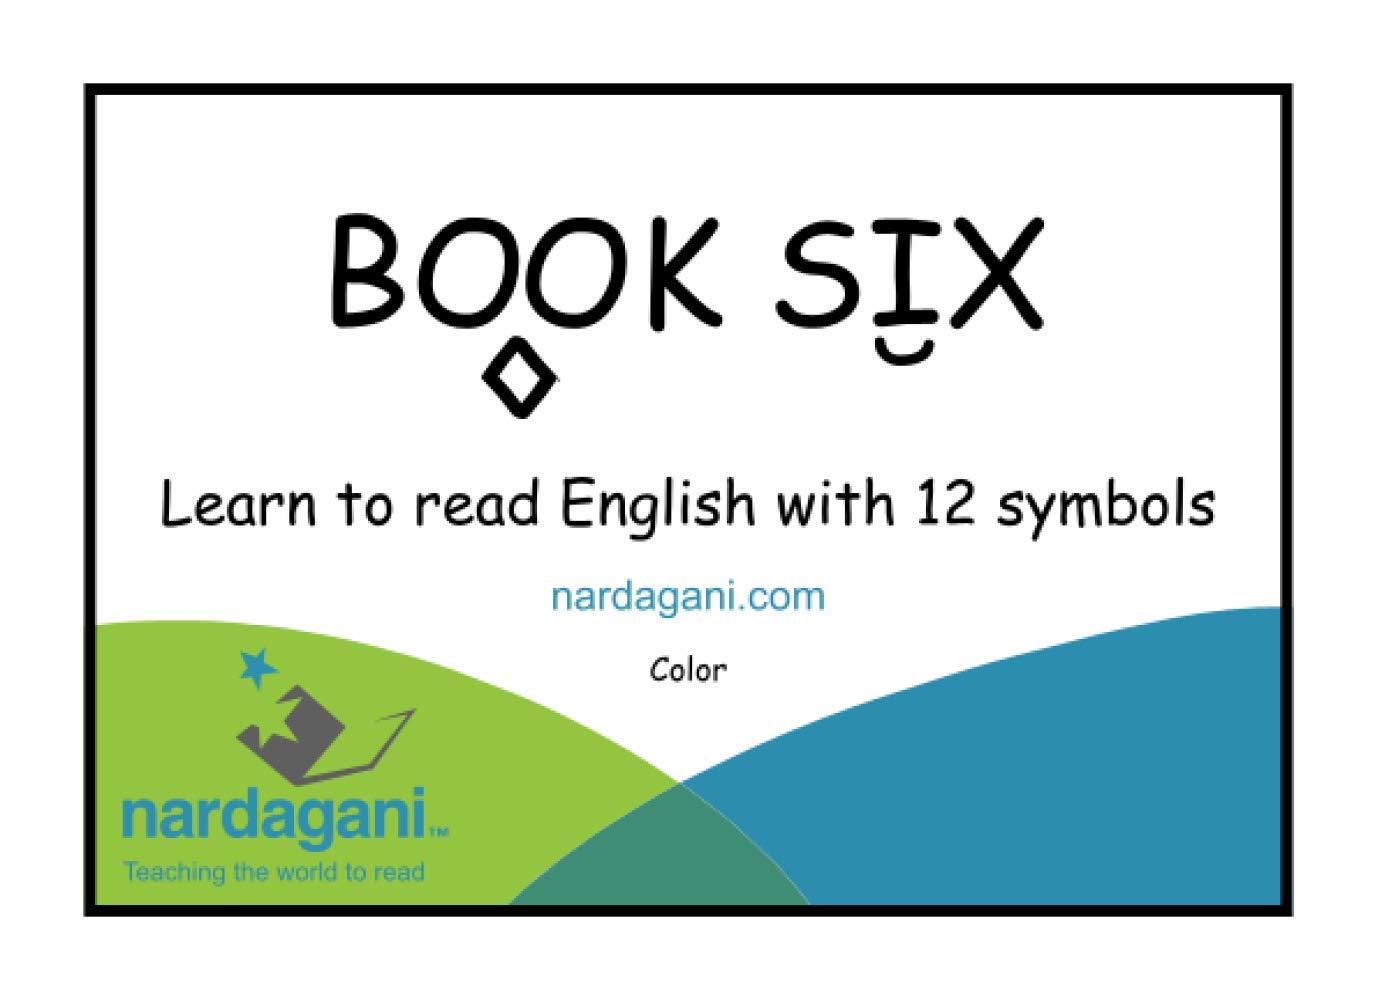 Book Six (Color) Nardagani, Narda Pitkethly, Bridget Matloff, Blake Thornton